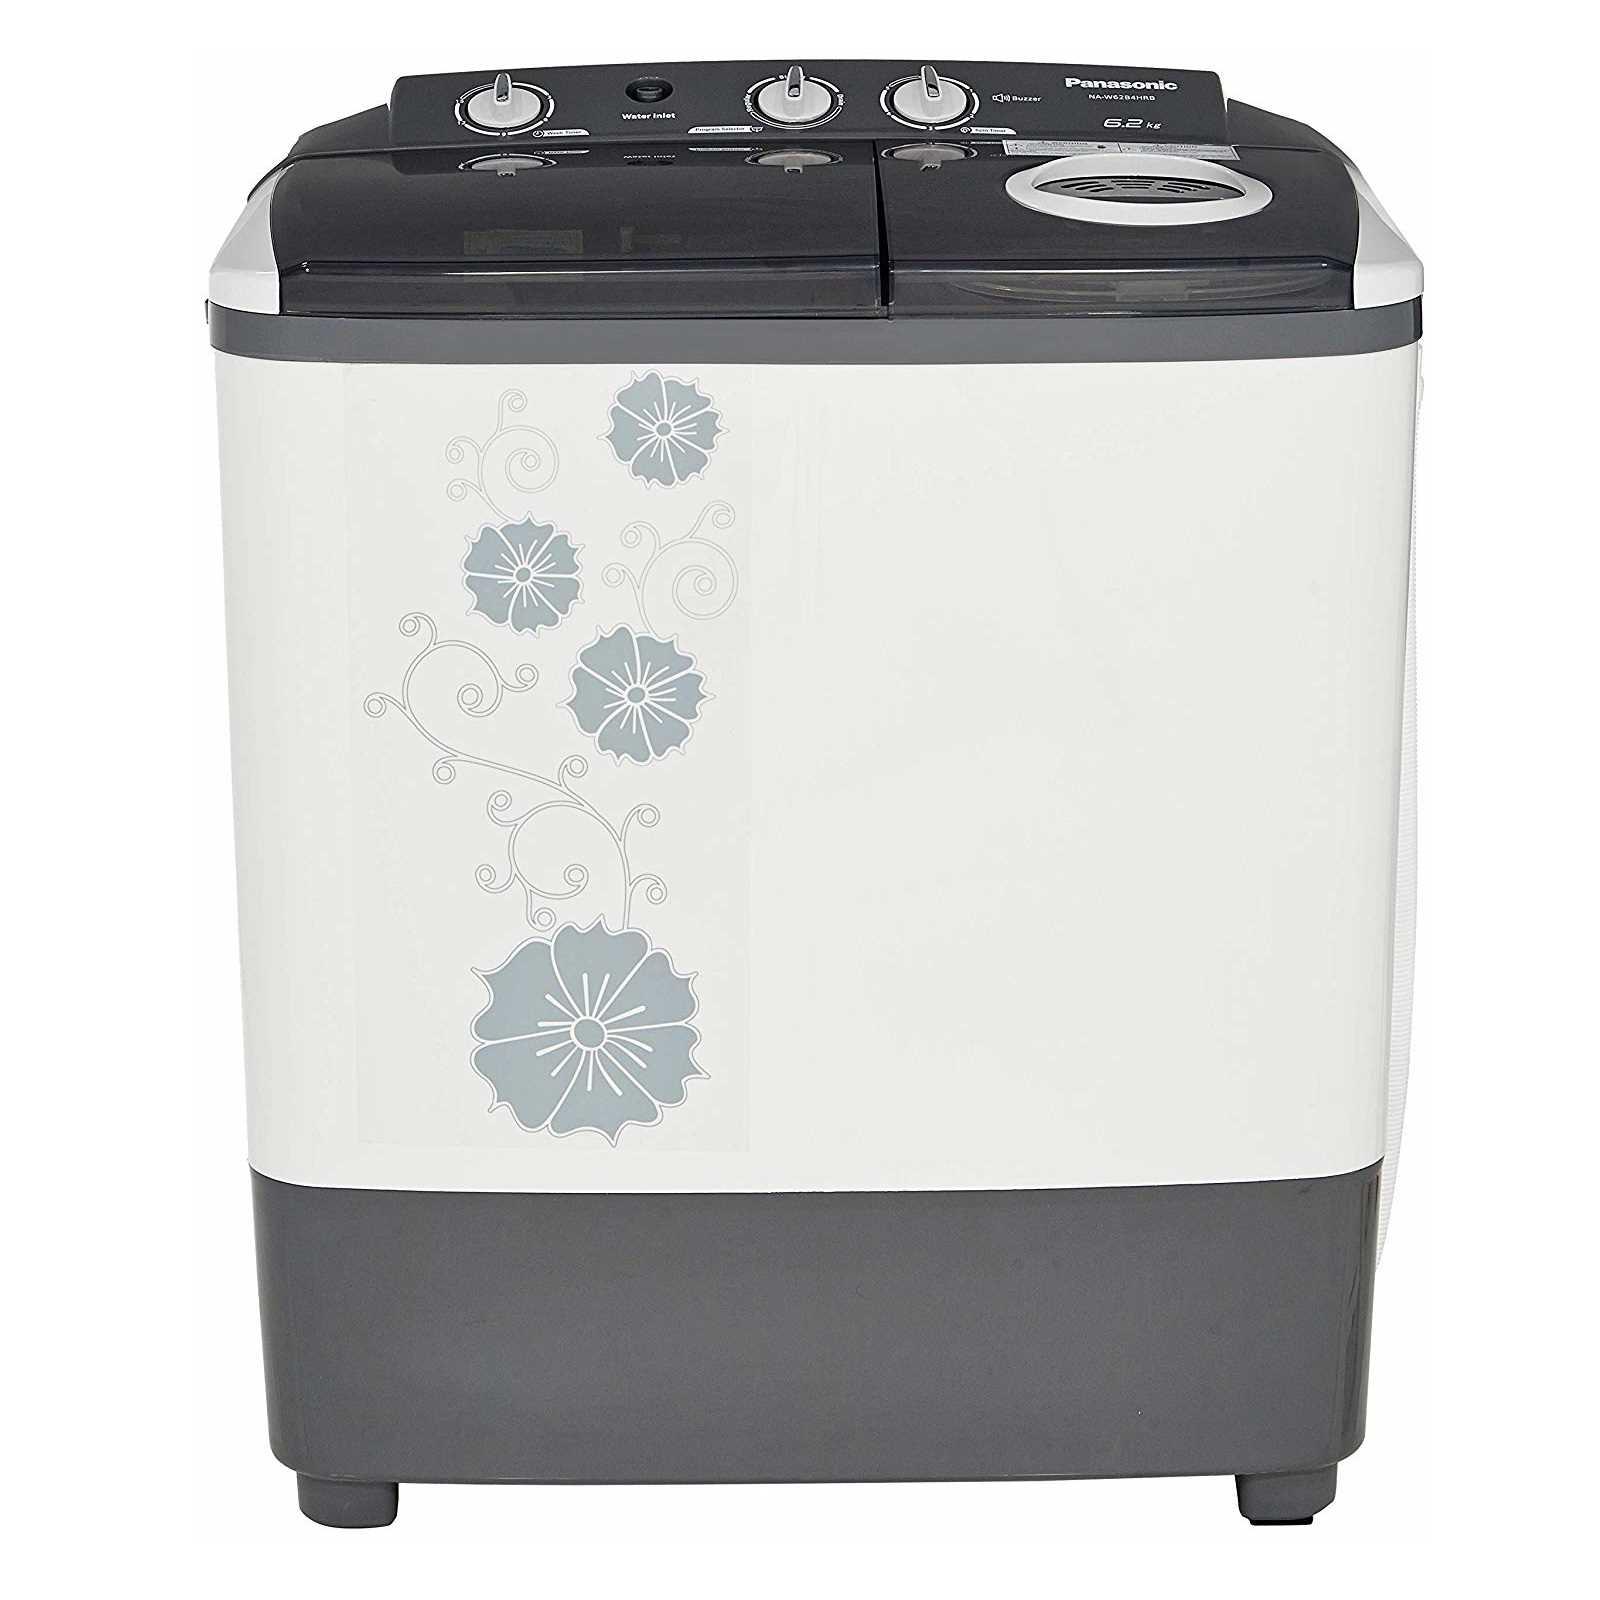 Panasonic NA-W62B4HRB 6.2 Kg Semi Automatic Top Loading Washing Machine